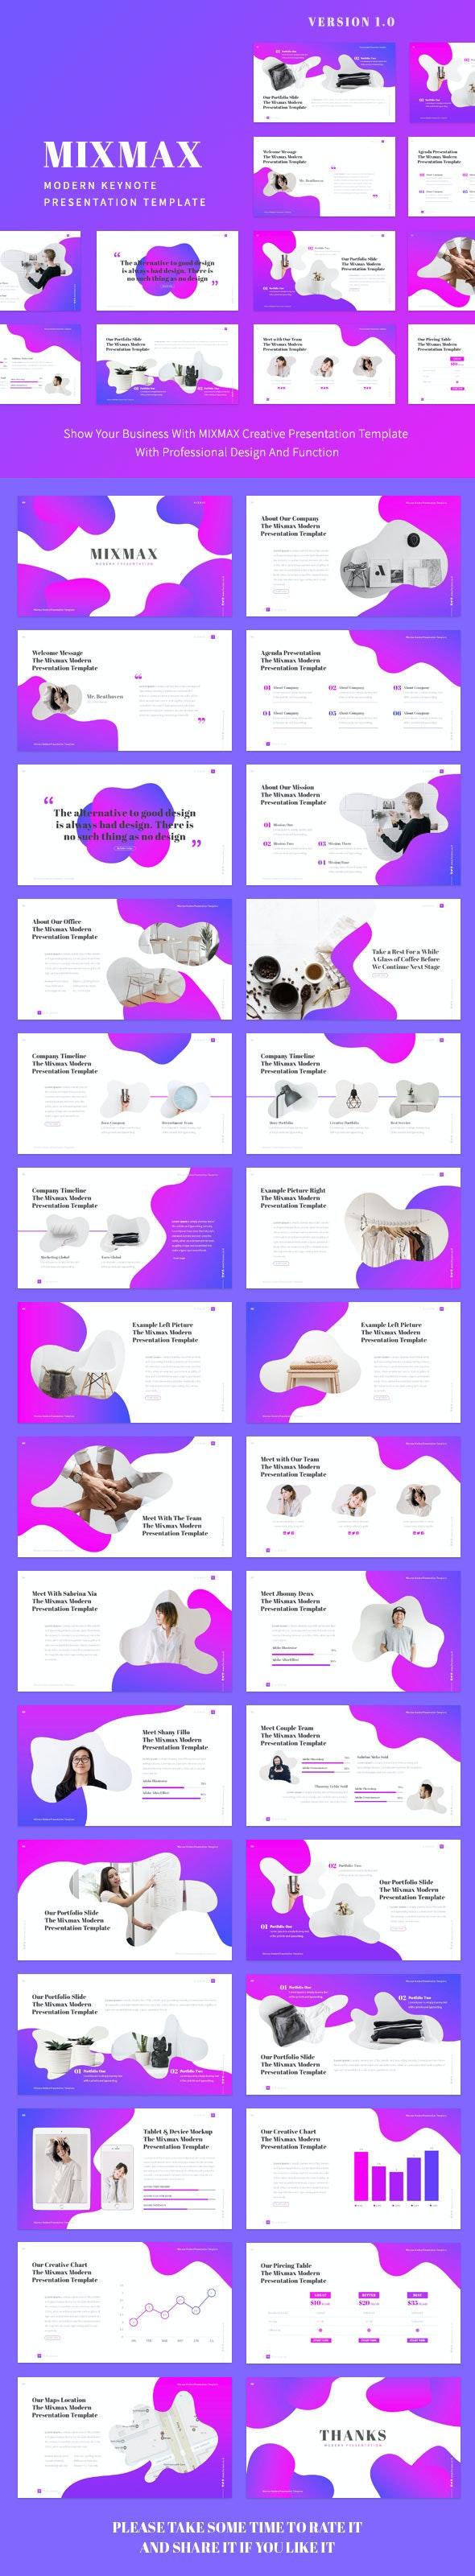 Mixmax - Modern Keynote Presentation Template - Creative Keynote Templates